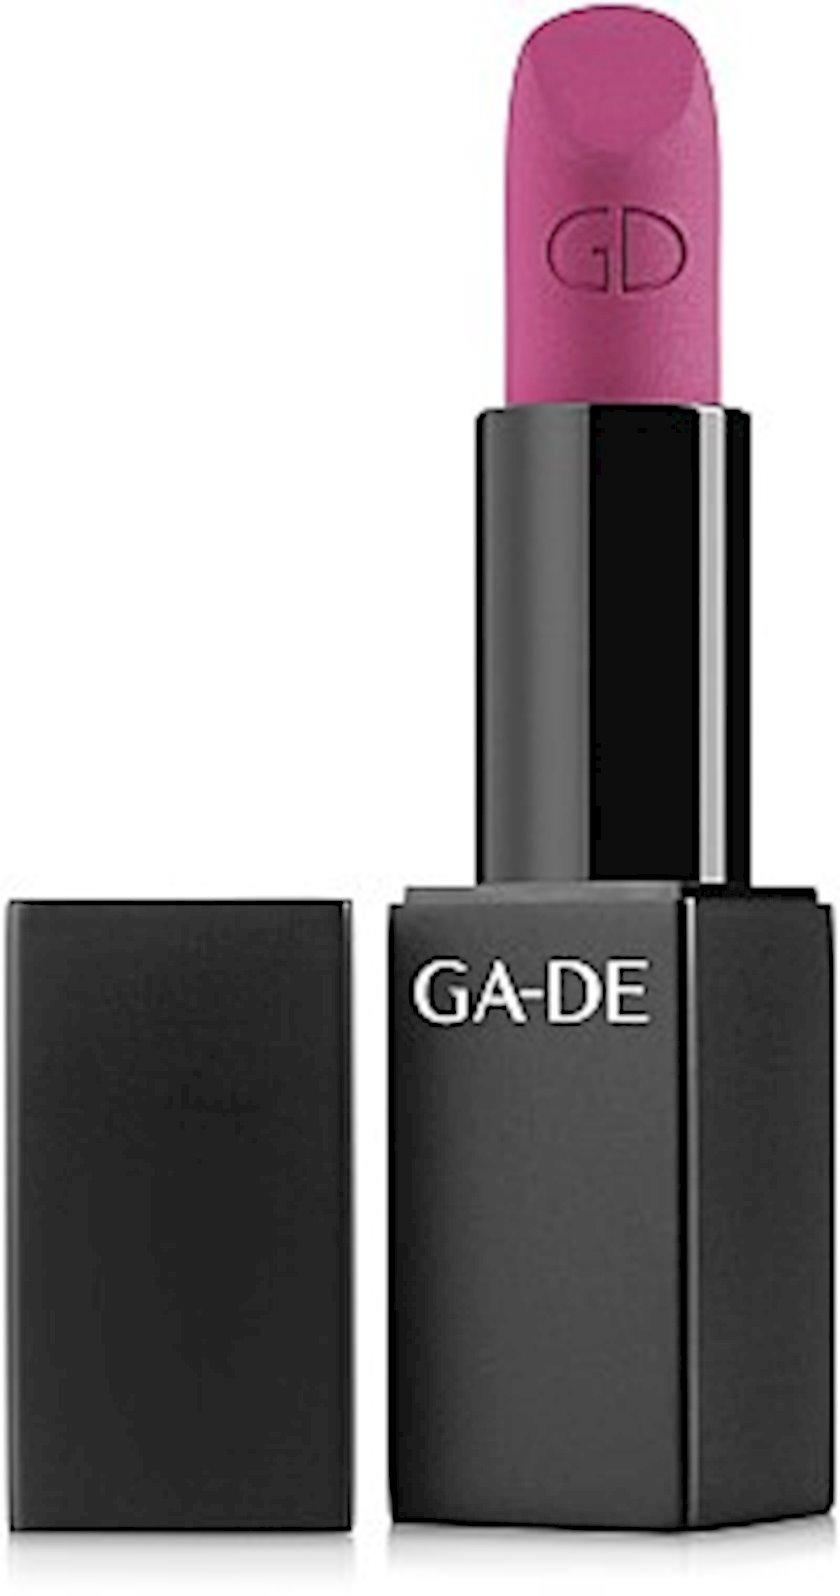 Dodaq üçün mat pomada Ga-De Velveteen Pure Matte Lipstick 764 Conspirancy